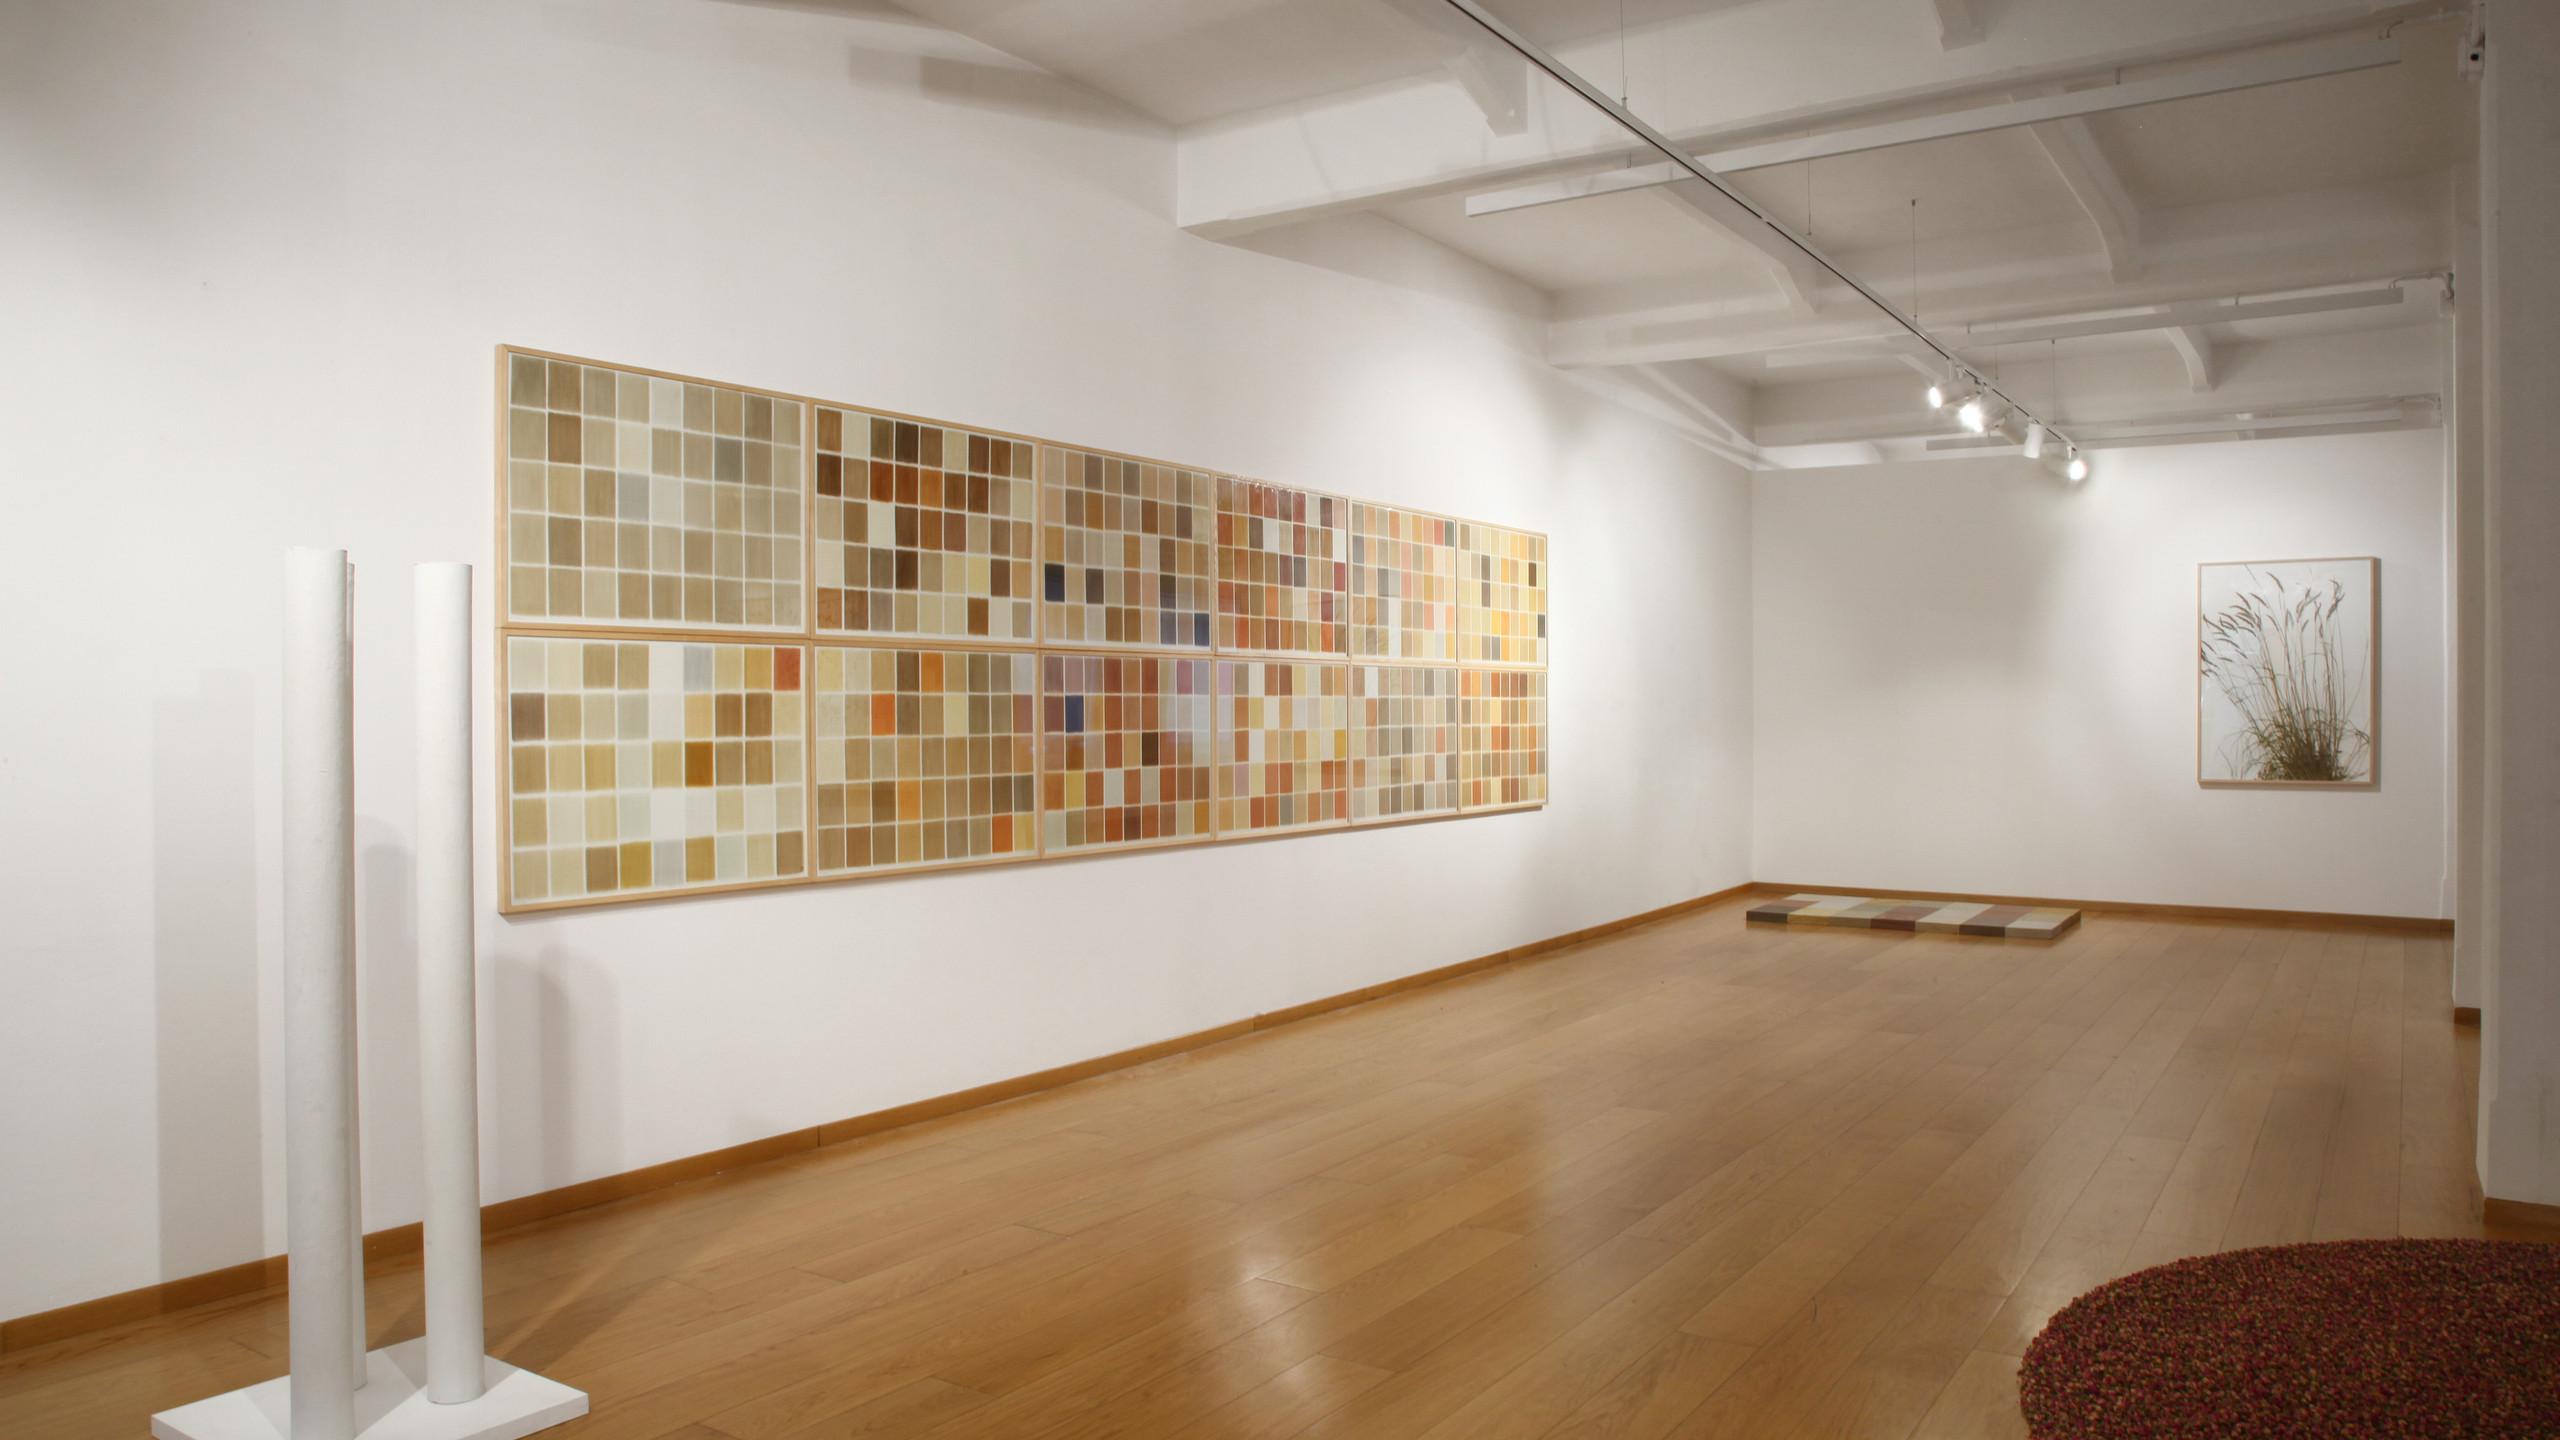 "Installation views ""herman de vries: all all all"", Cortesi Gallery Milan. Photo by Bruno Bani. Courtesy Cortesi Gallery London, Milan, Lugano"